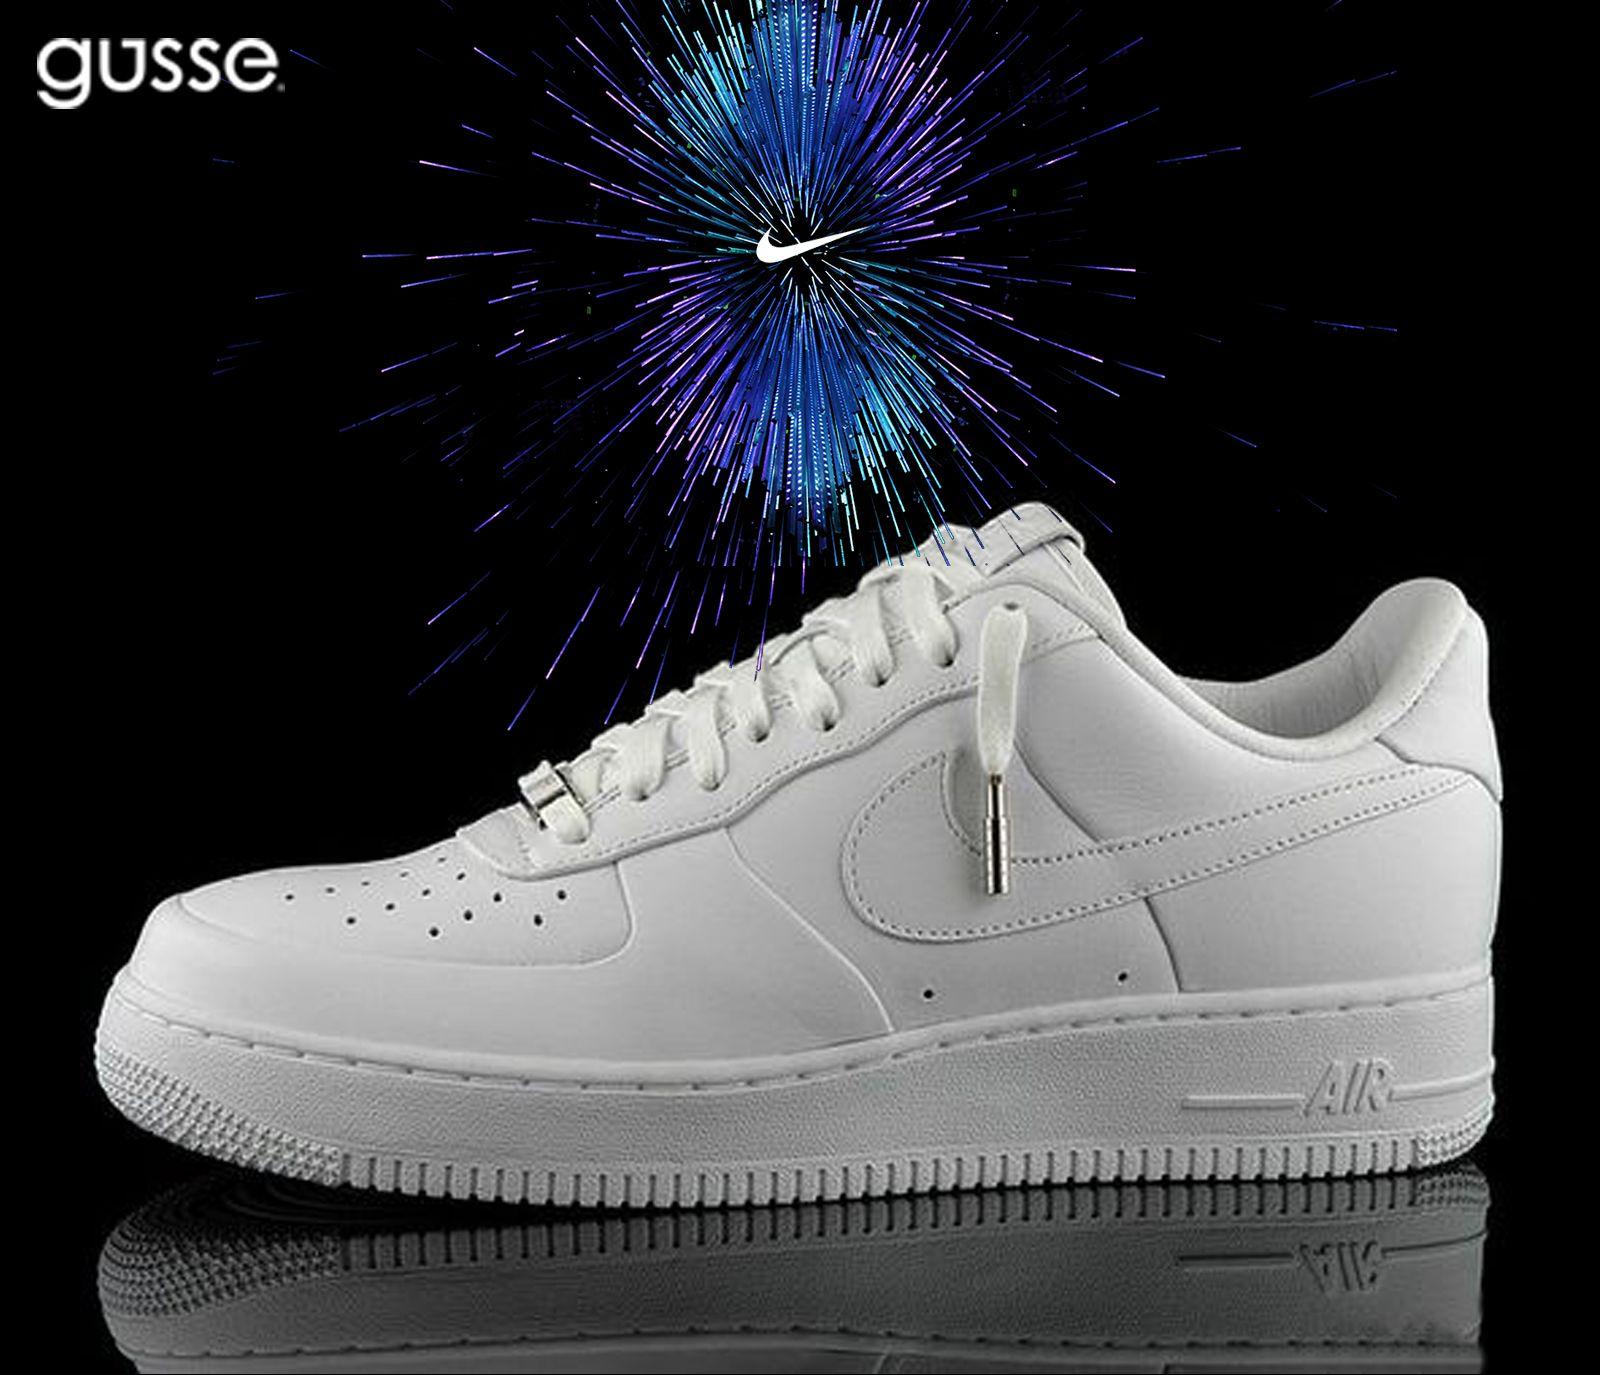 Orjinal Nike Modelleri Gusse Com Tr De Urun Kodu 315122 111 Orjinal Urun Garantili Nasil Siparis Verebilirim Gusse Com Tr Adresin Nike Urunler